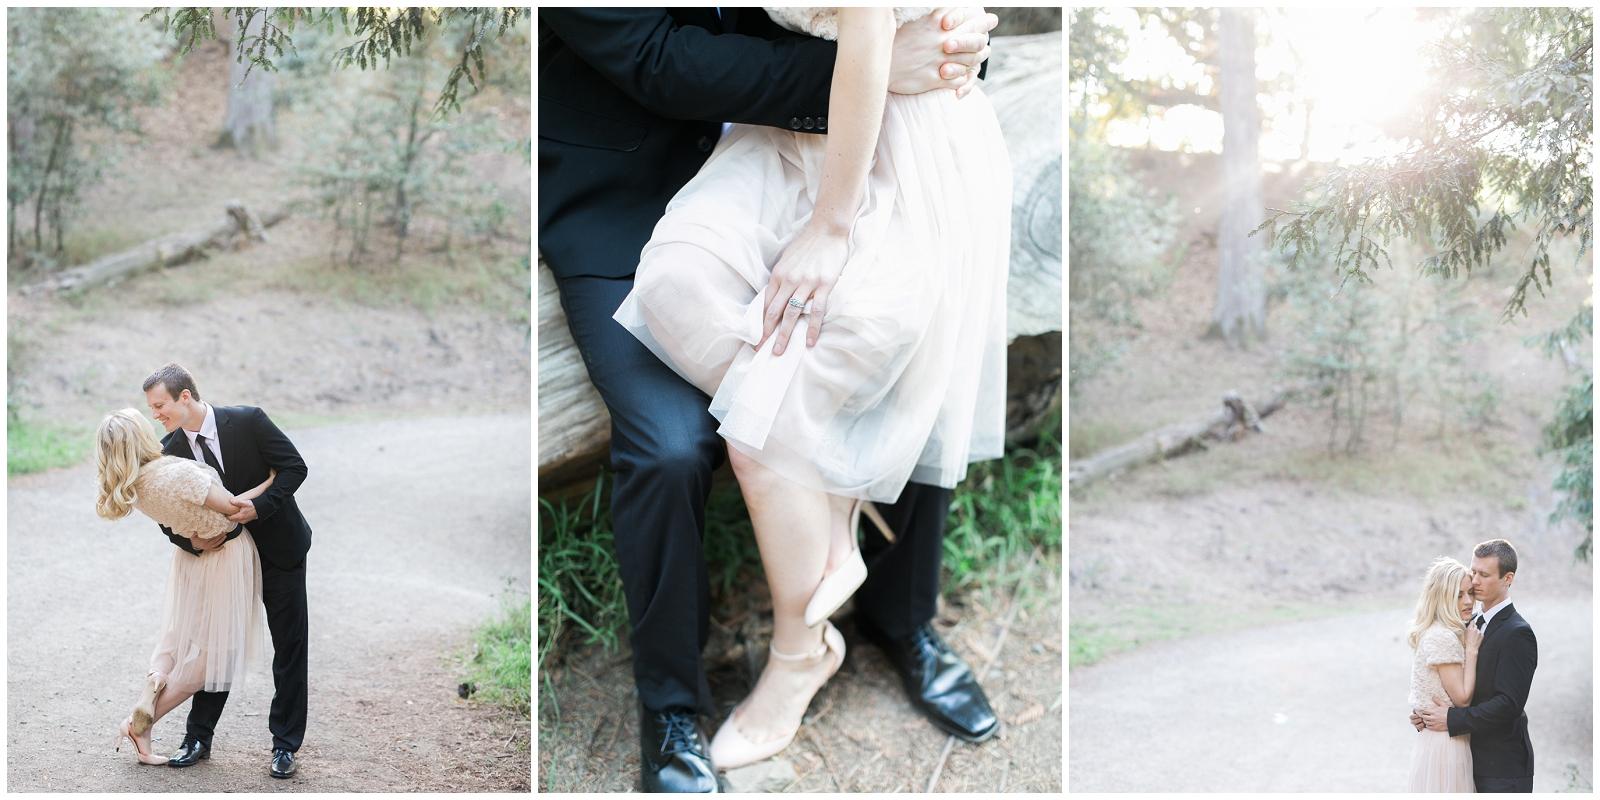 San-Francisco-Bay-Area-Wedding-Photography-Engagement-Redwoods-6.jpg